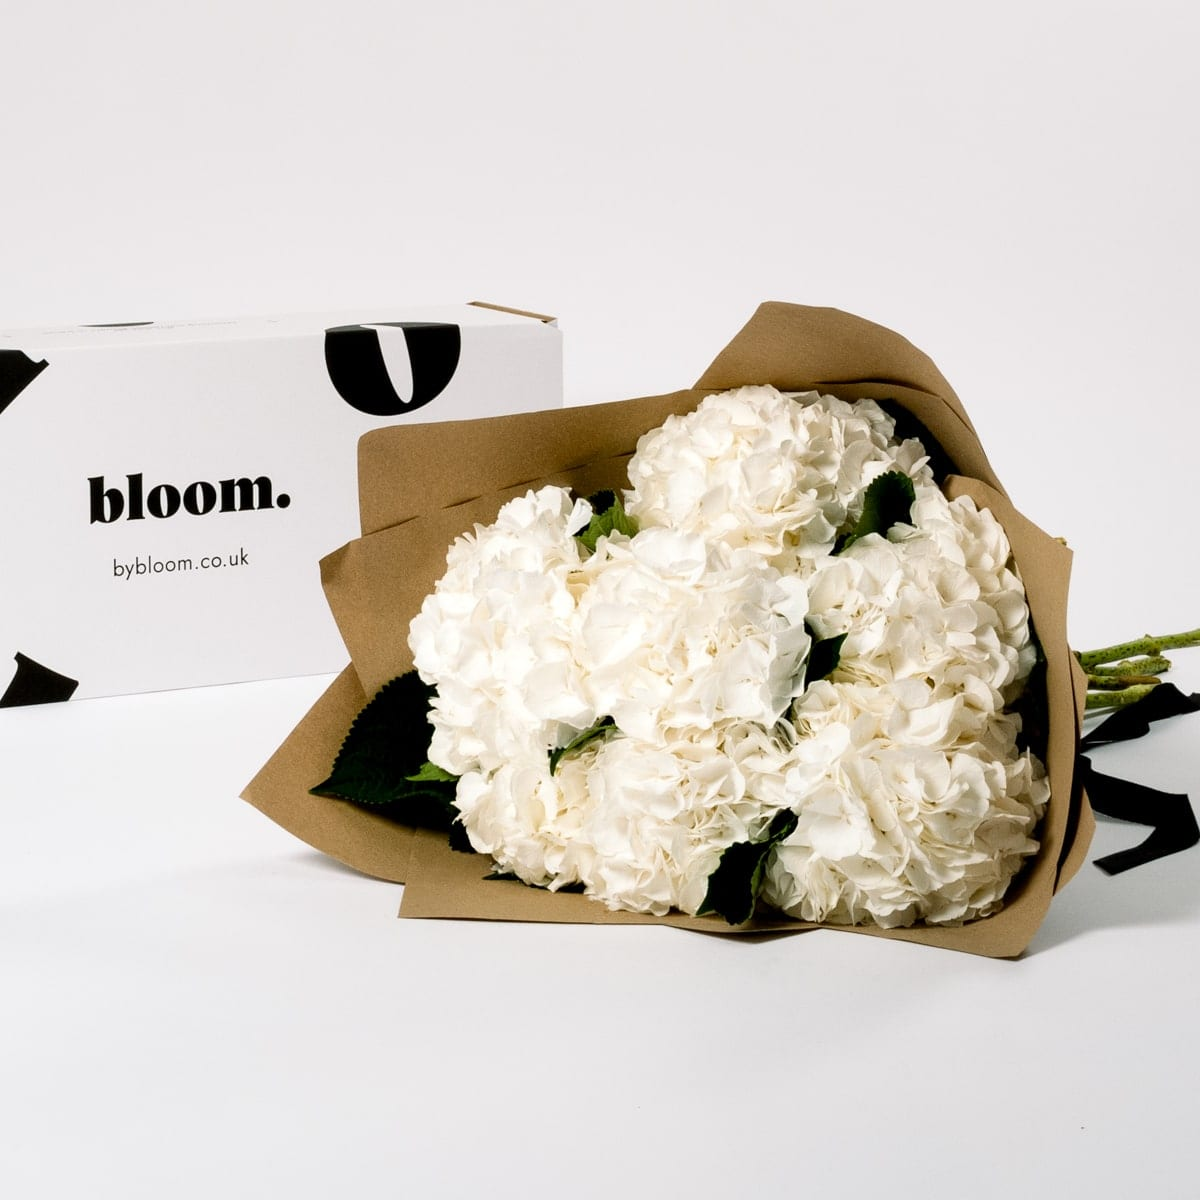 Bloom Flower Delivery   Cloud White Hydrangea